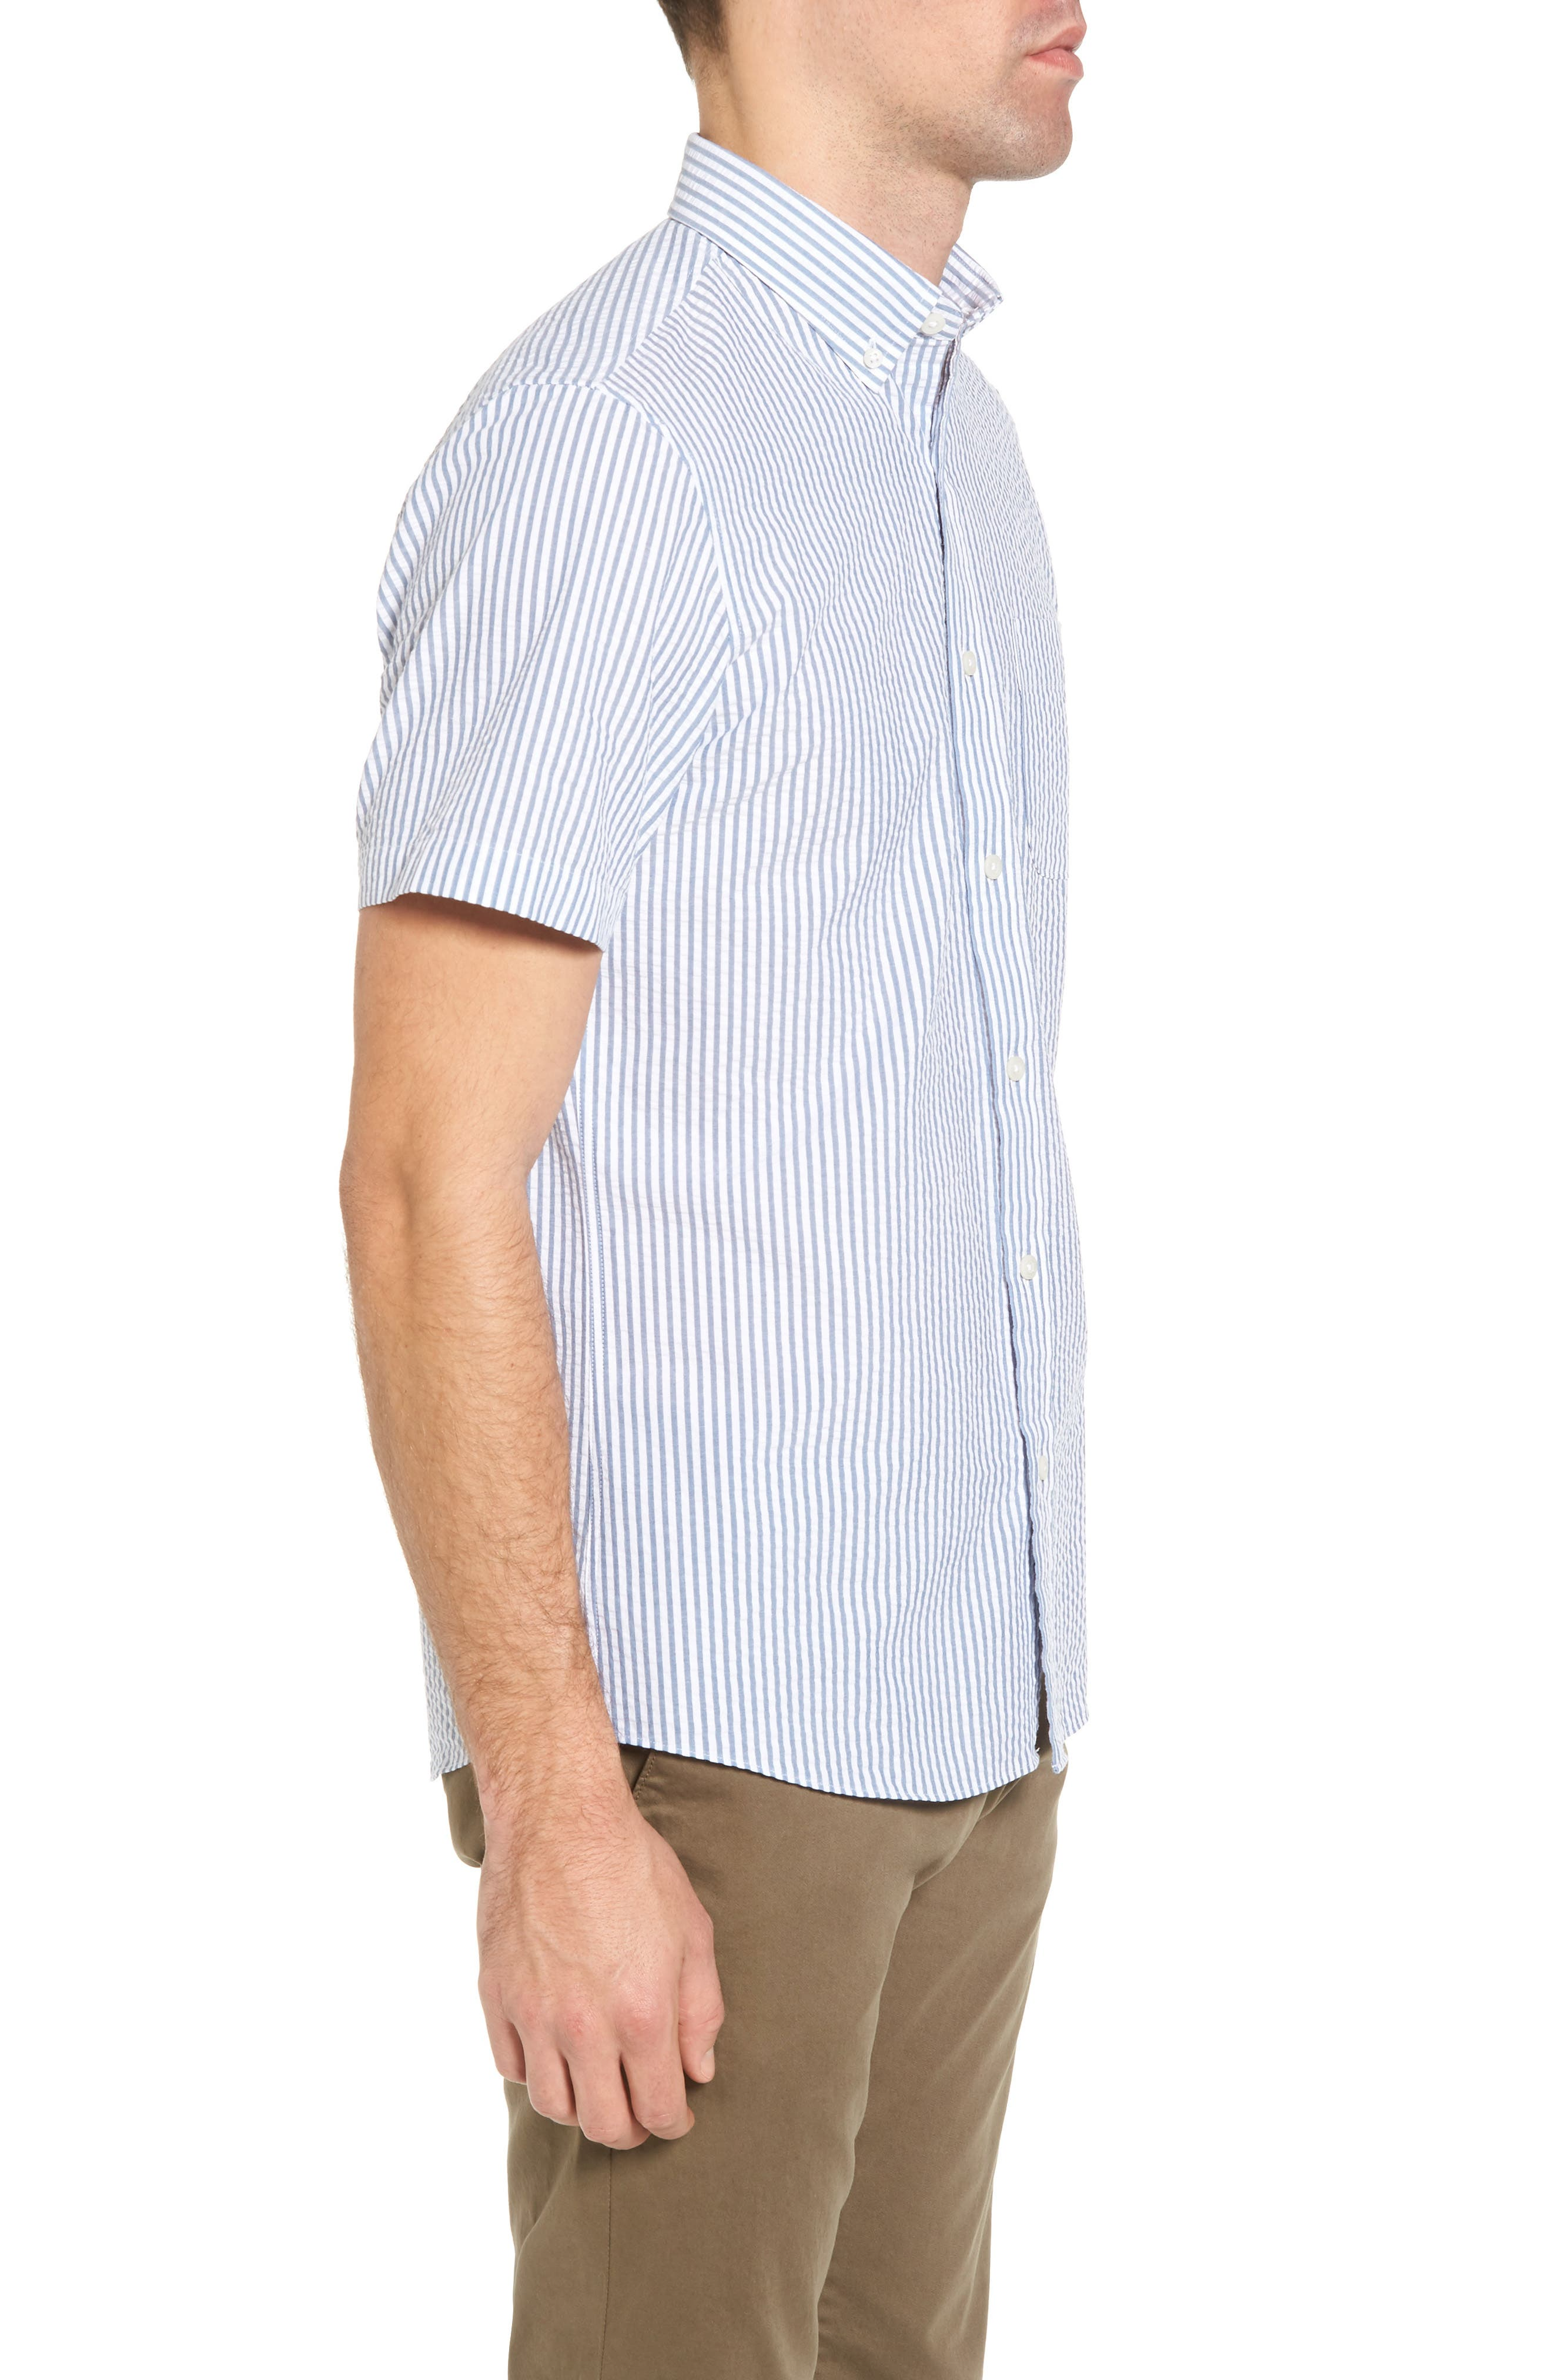 Trim Fit Seersucker Short Sleeve Sport Shirt,                             Alternate thumbnail 4, color,                             White Navy Seersucker Stripe